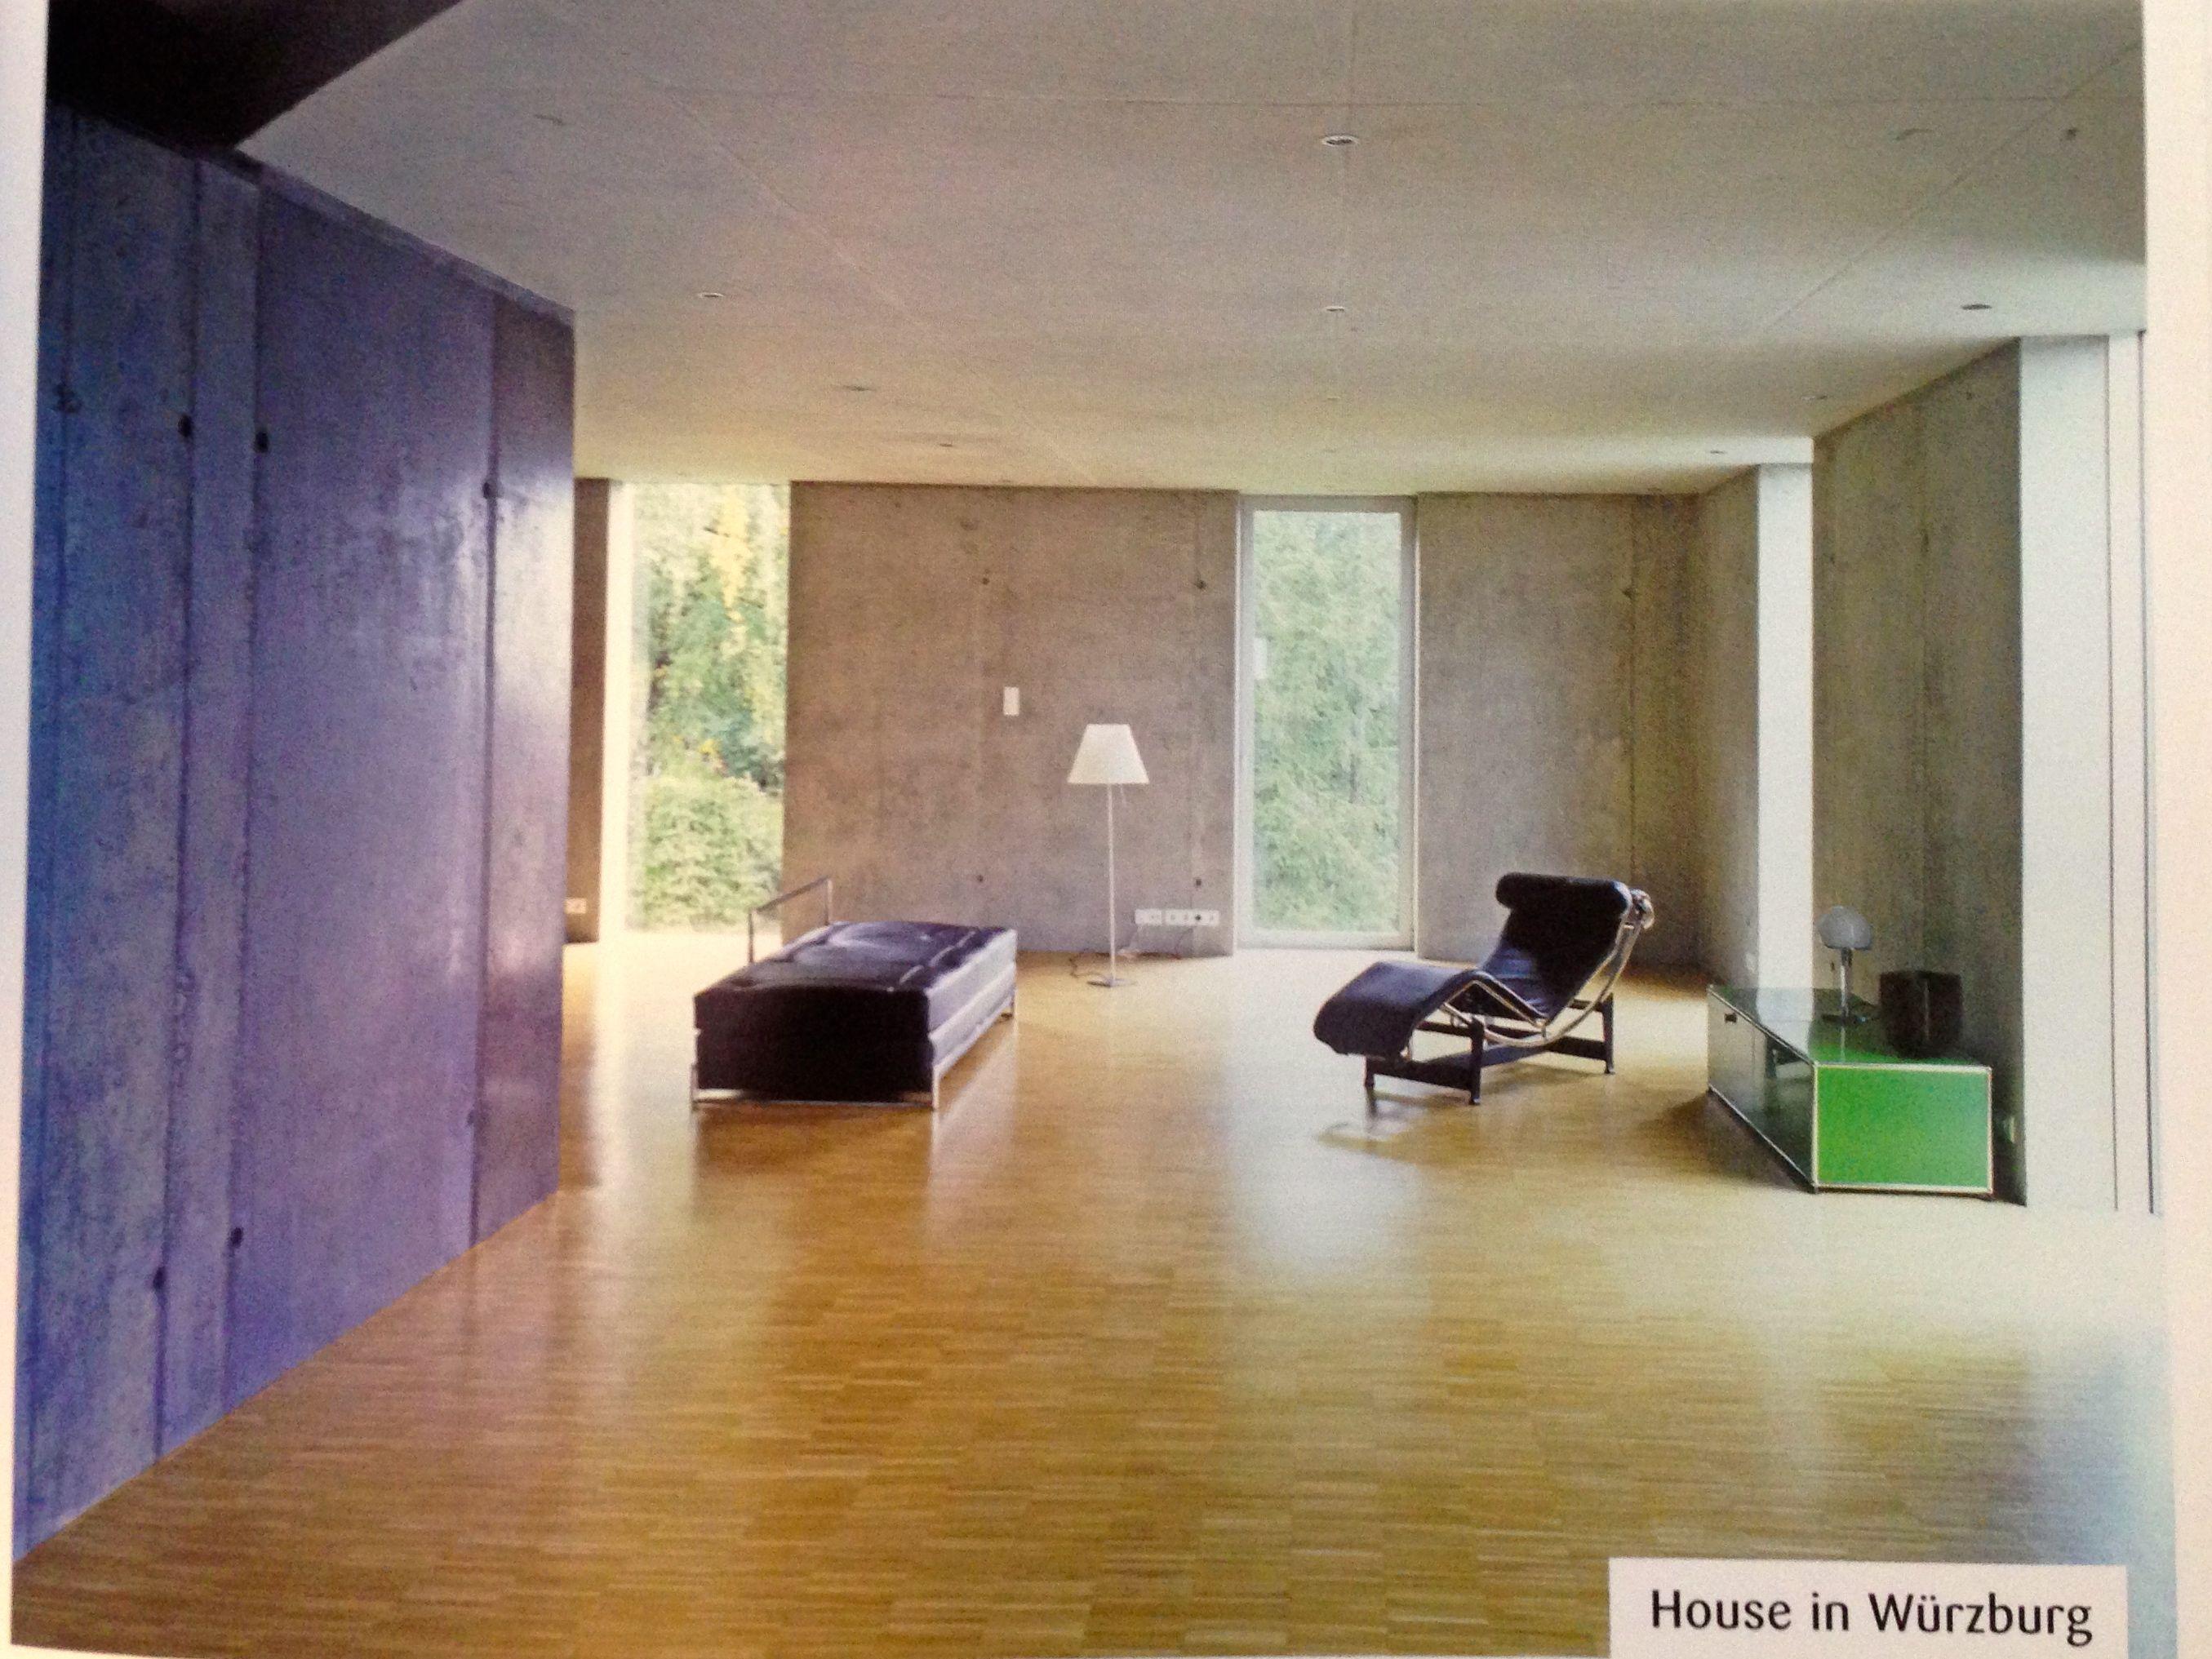 Concrete Walls Alternatives To Drywall Alternatives To